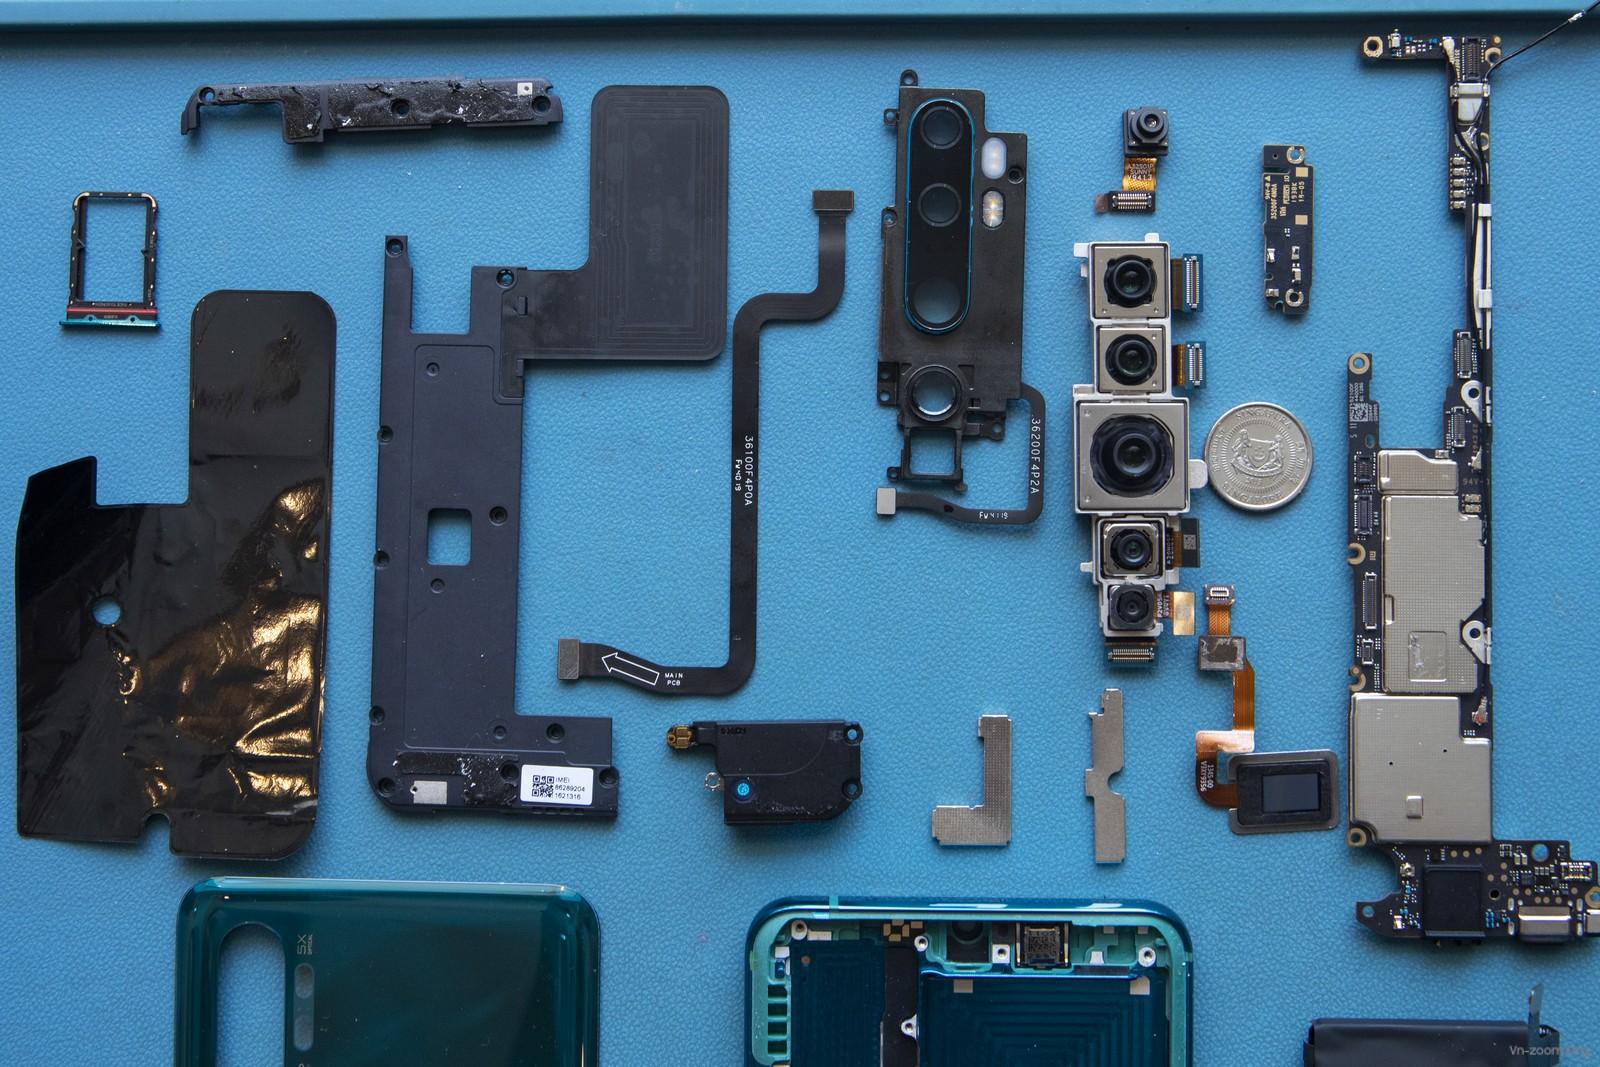 191217-Xiaomi-Mi-Note-10-Teardown-020.jpg